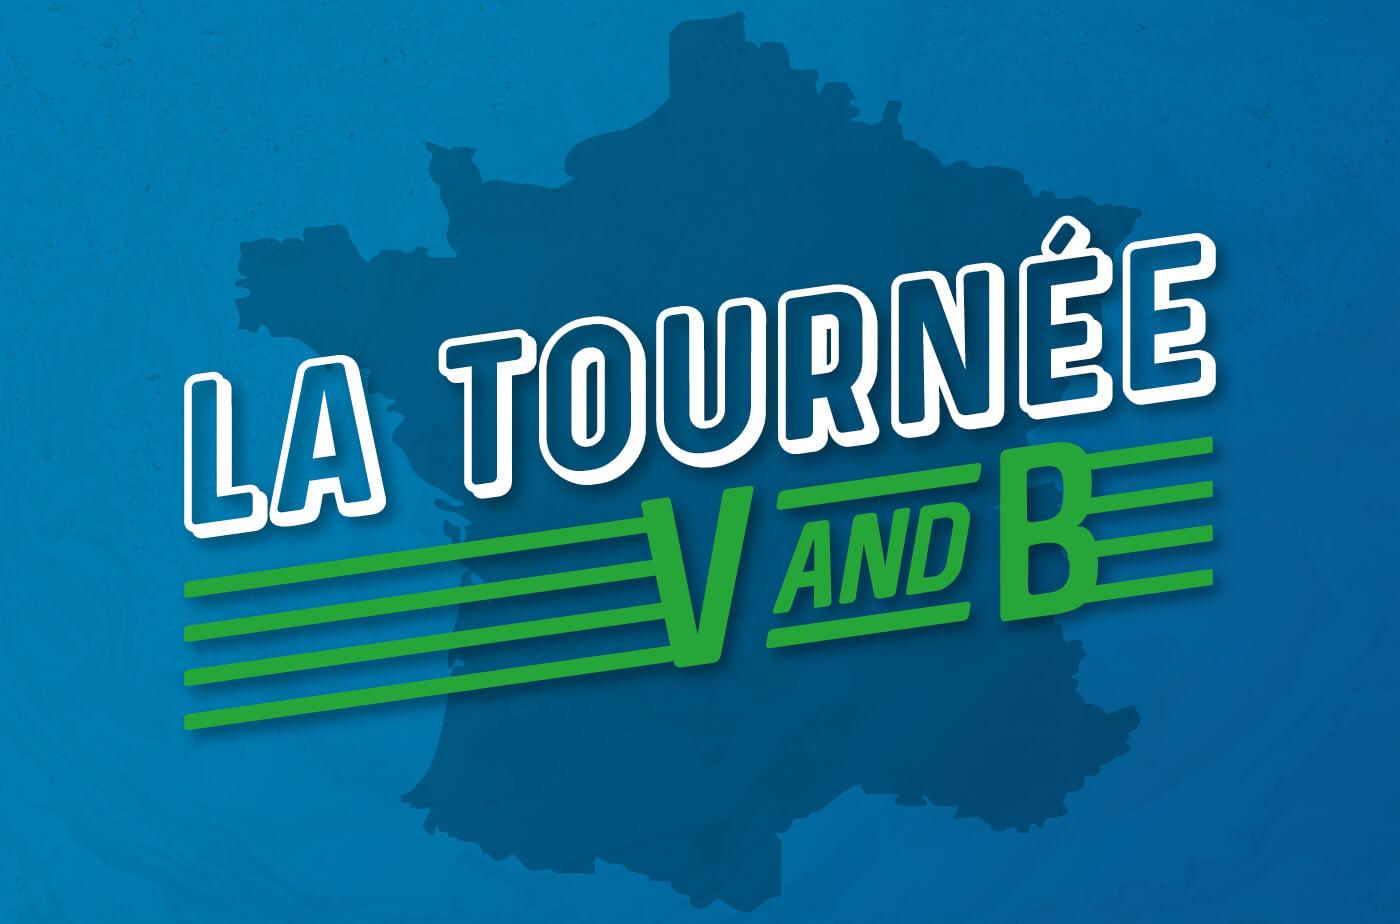 La-Tournée-V-and-B